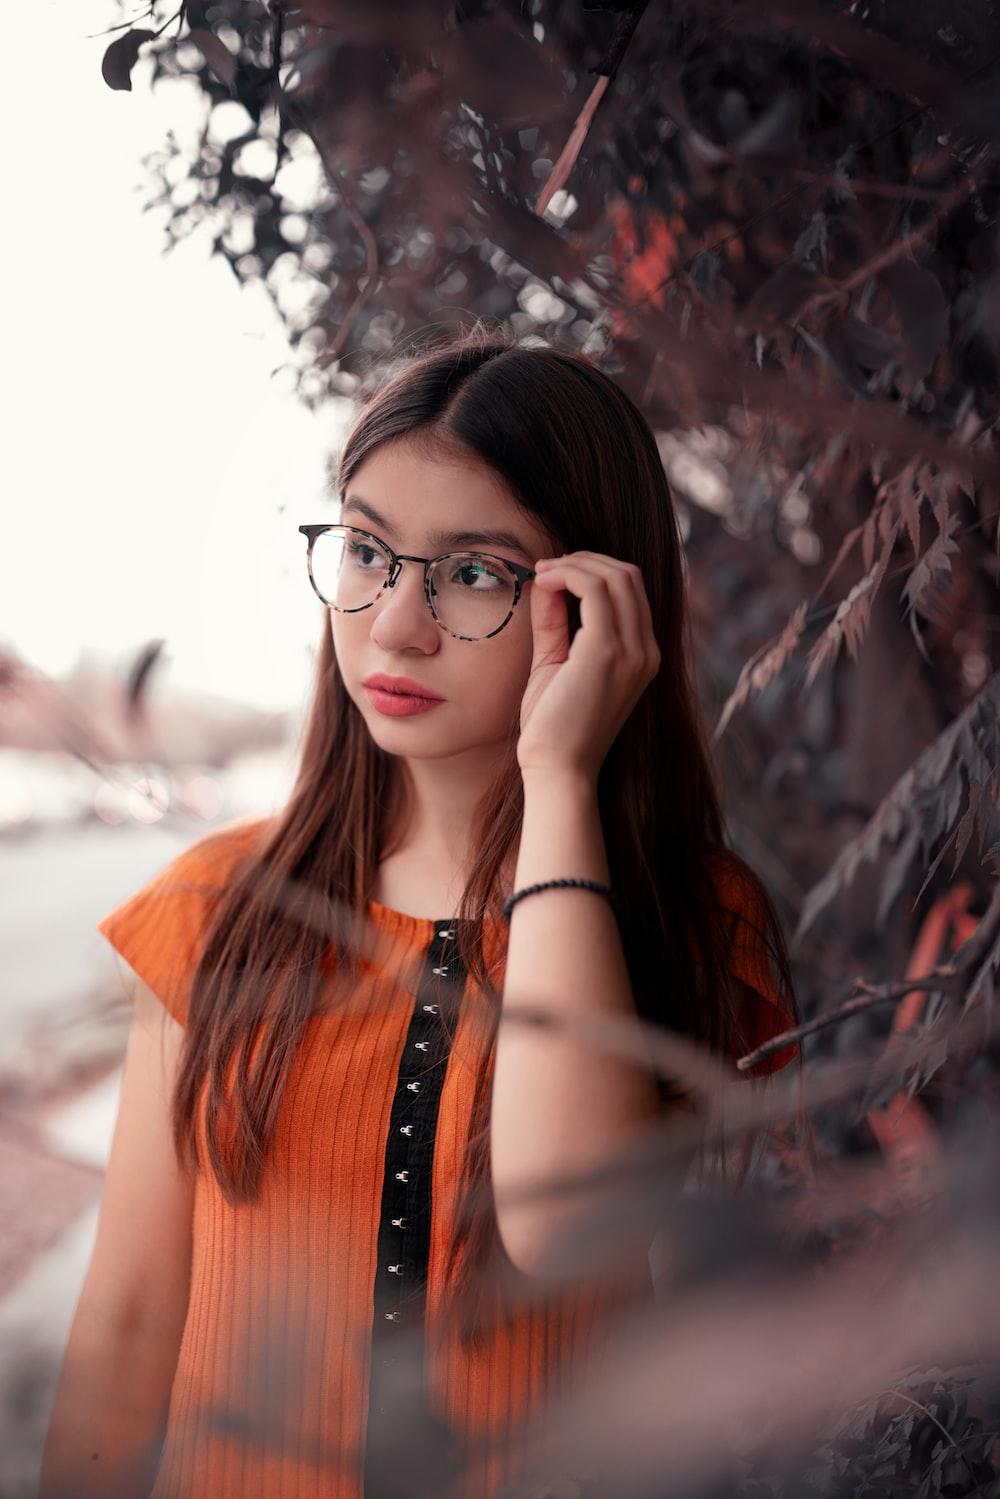 woman in orange and black top and eyeglasses